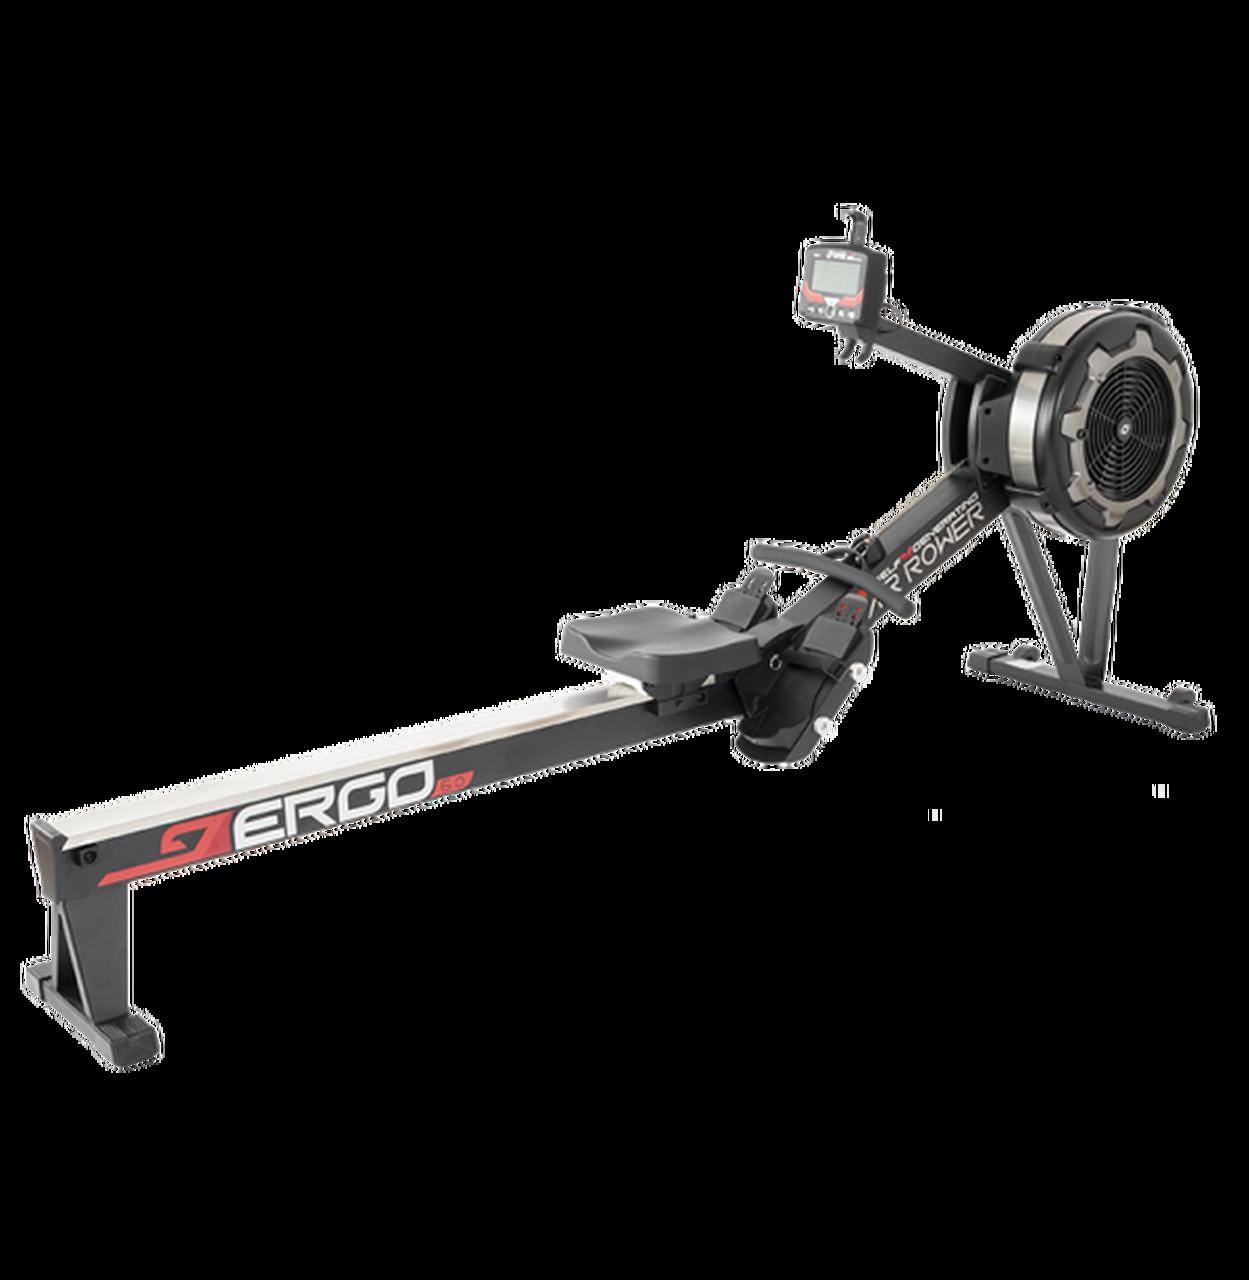 Orbit ERGO6.0 Air Rowing Machine.